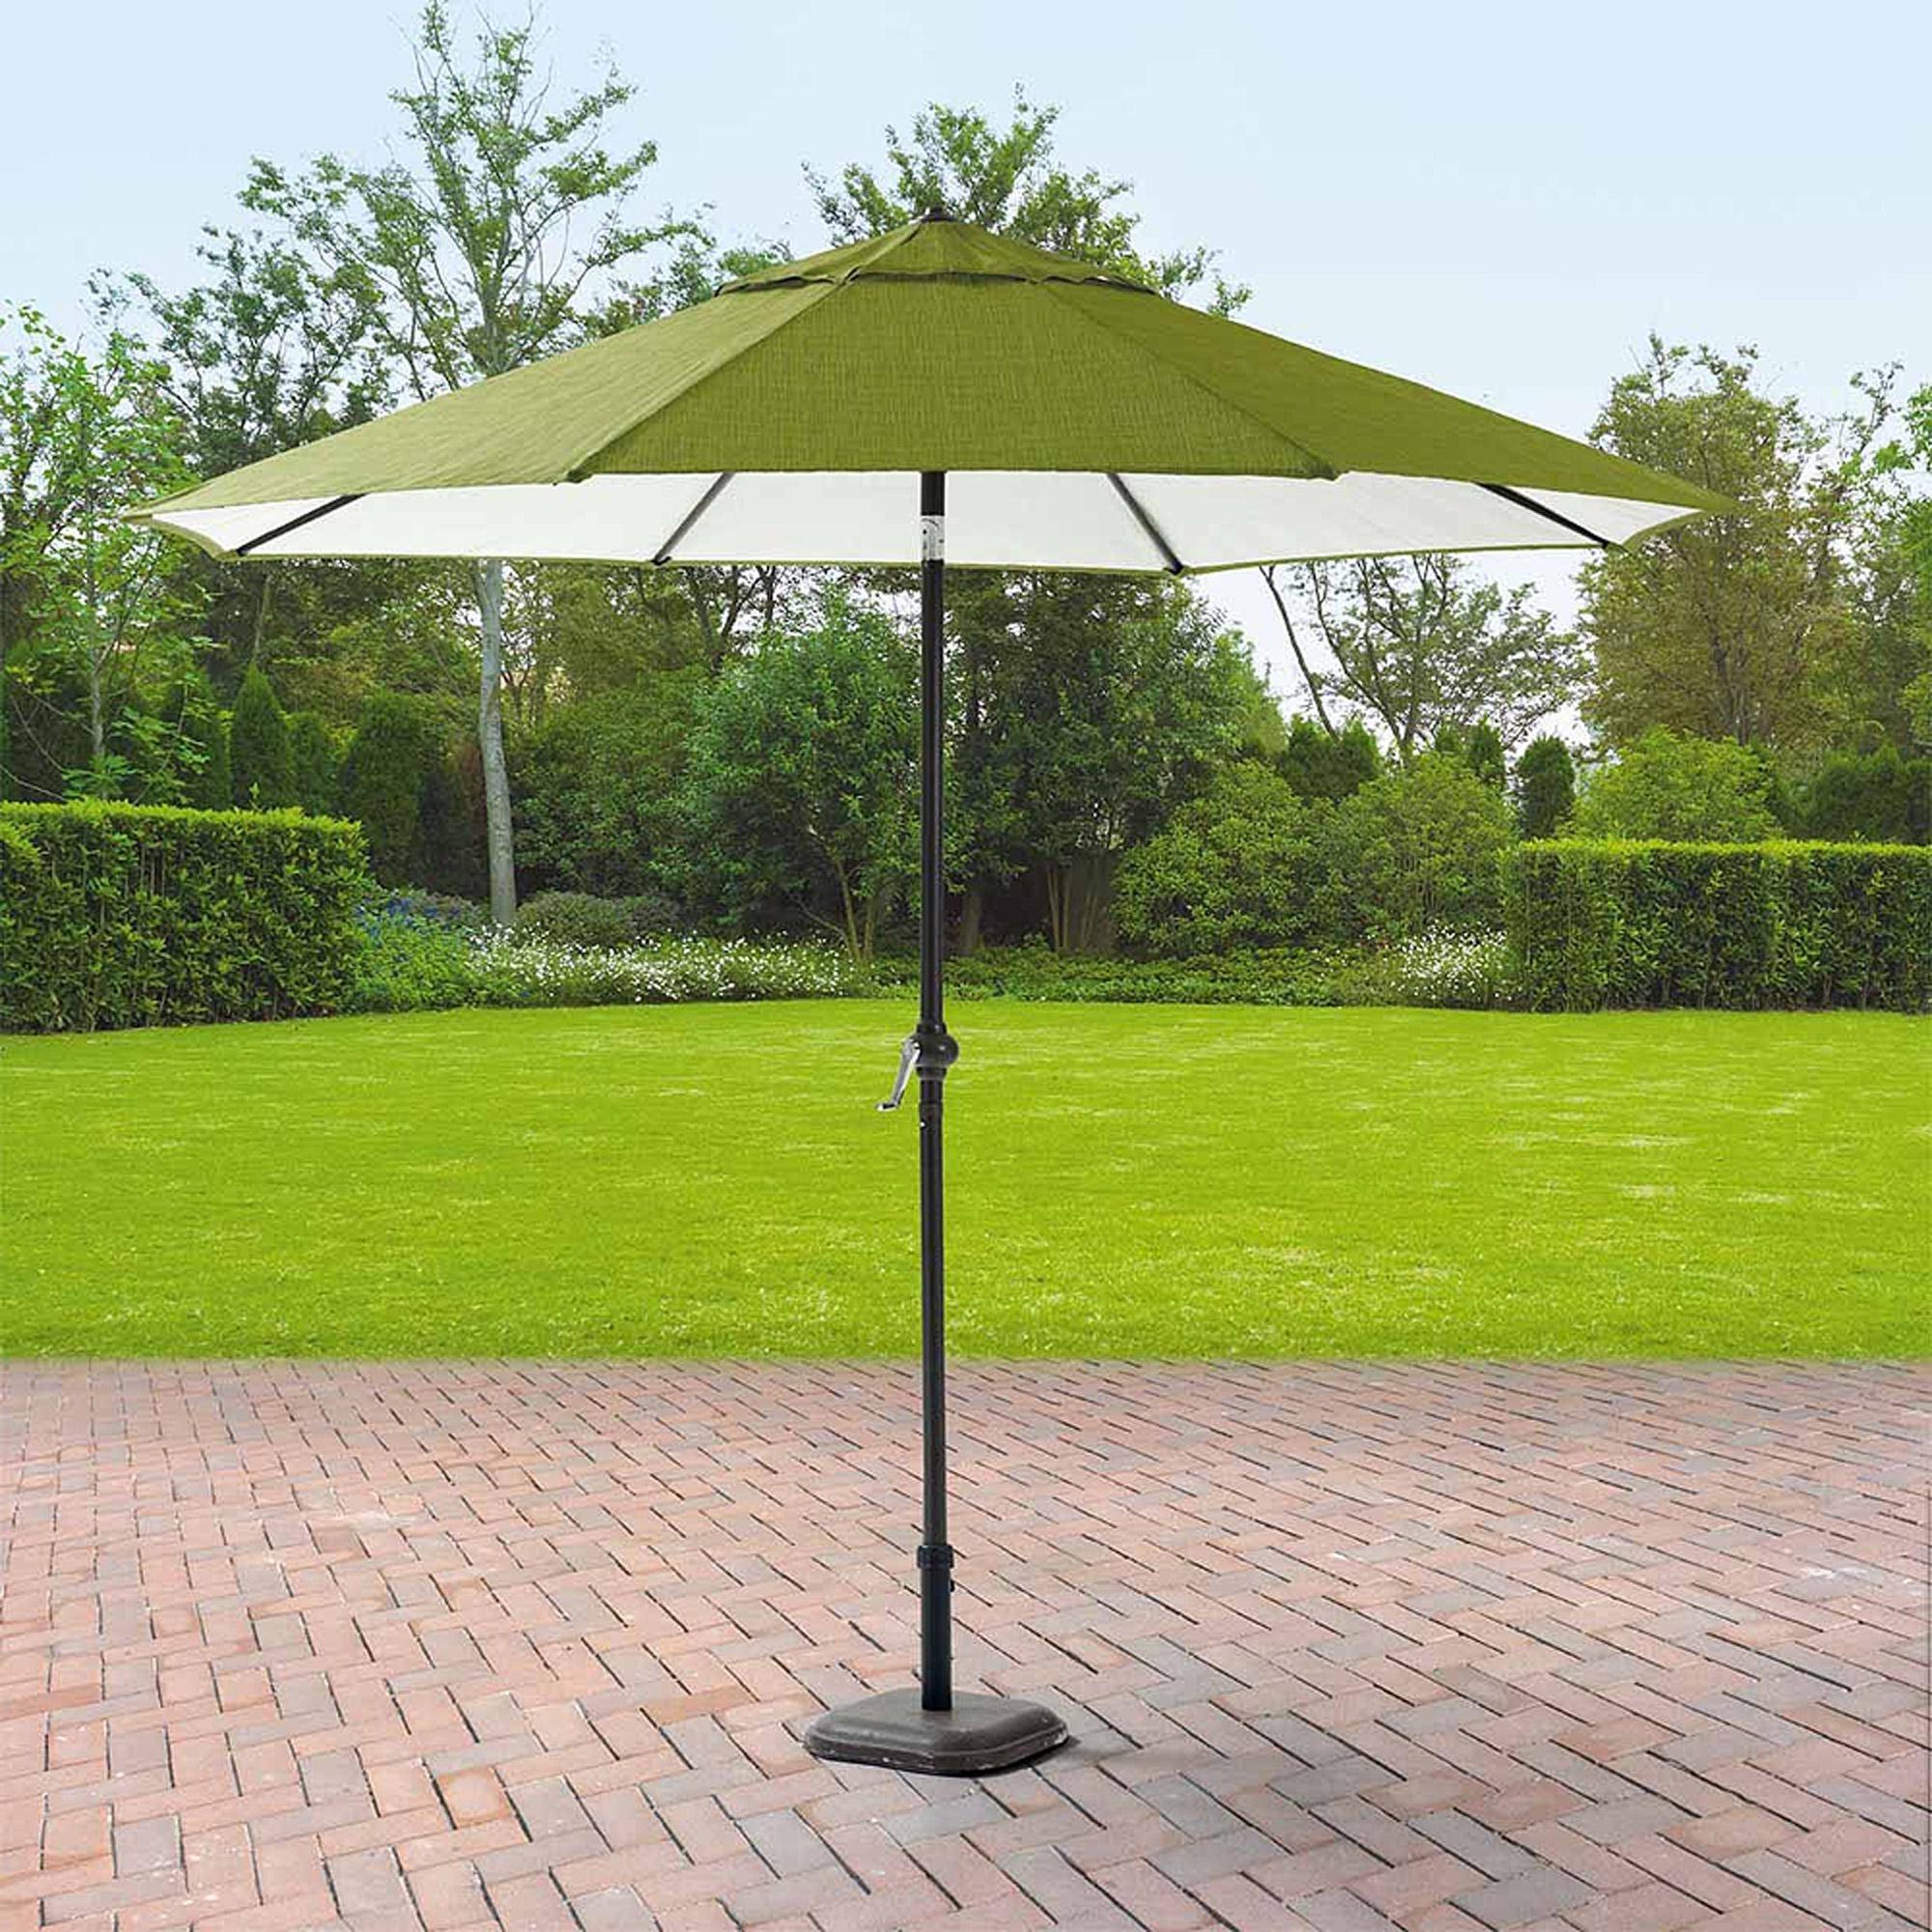 Patio Umbrellas Walmart – Home Design Ideas Regarding Current Sunbrella Patio Umbrellas At Walmart (View 15 of 20)